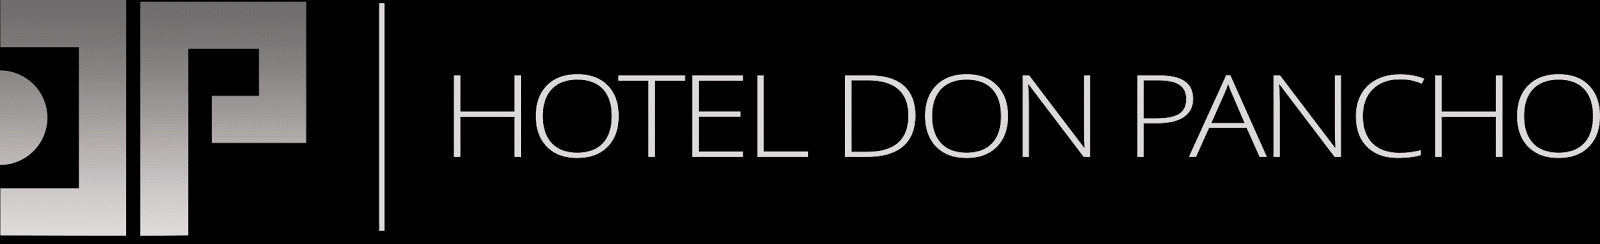 nuevo logo hotel